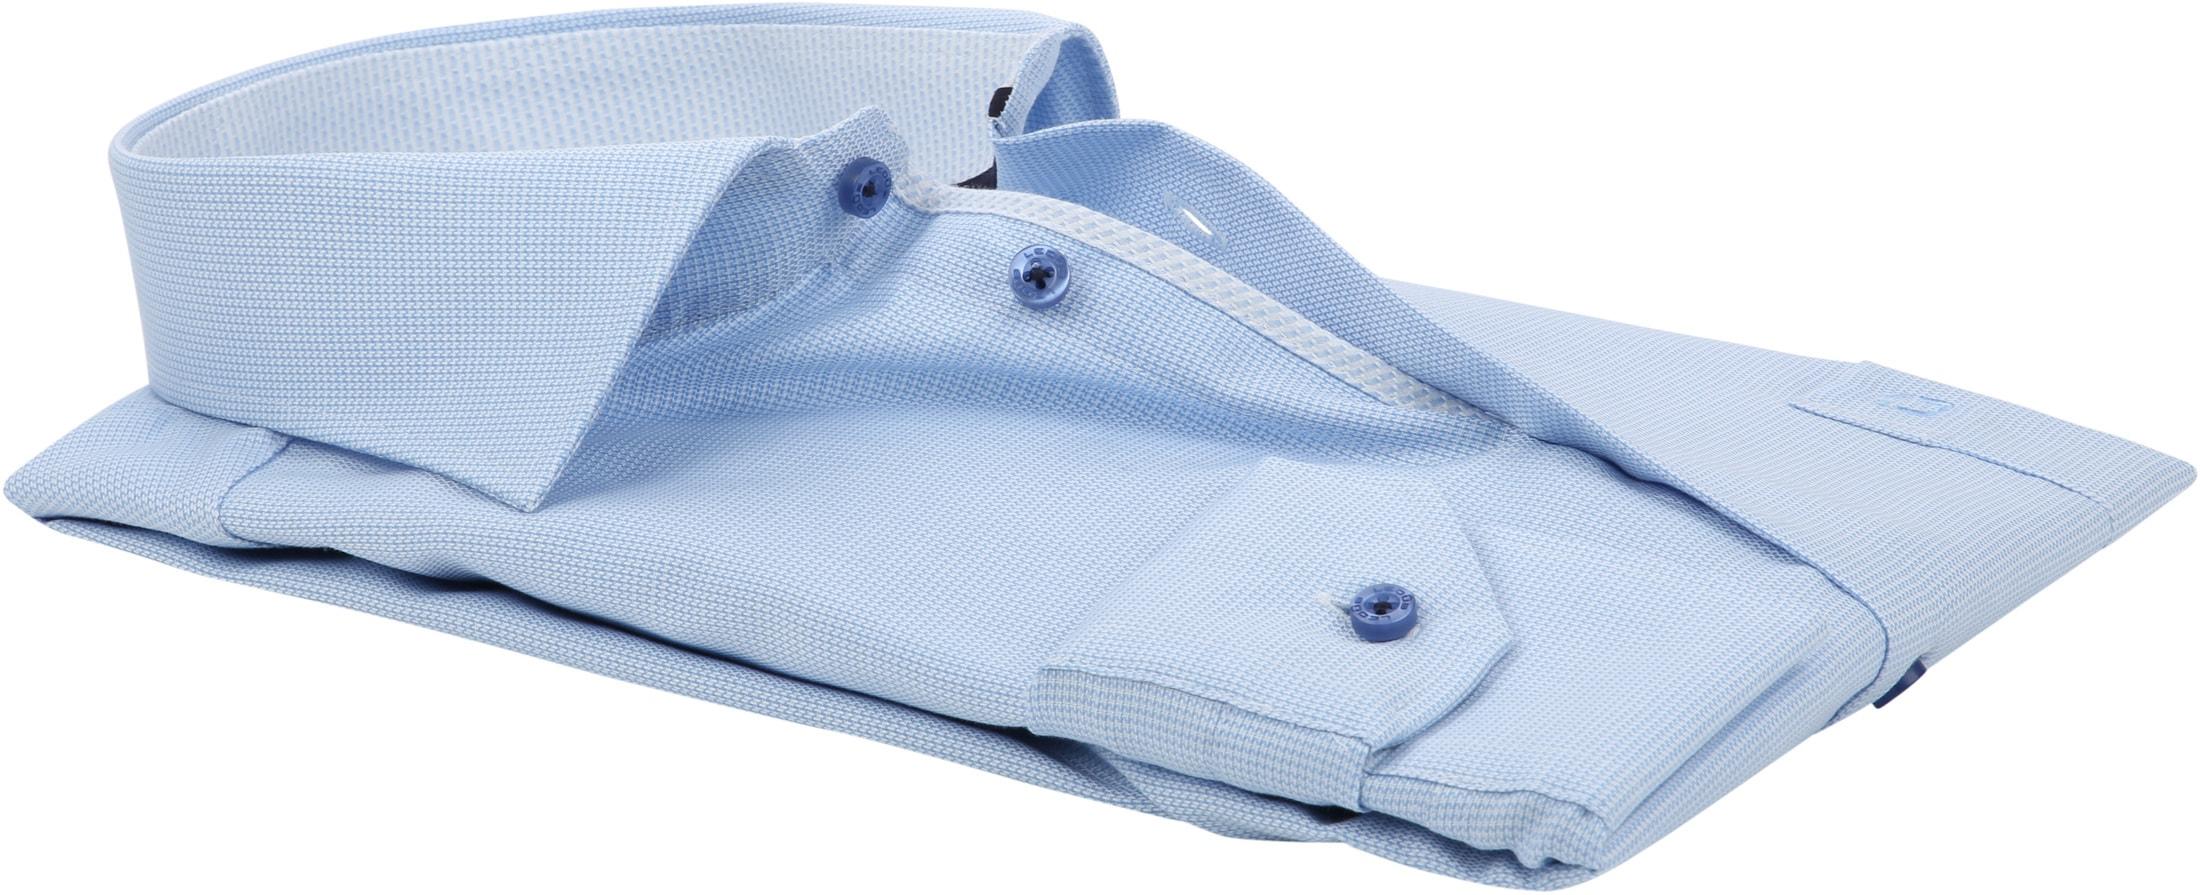 Ledub Overhemd Blauw Non Iron MF foto 3